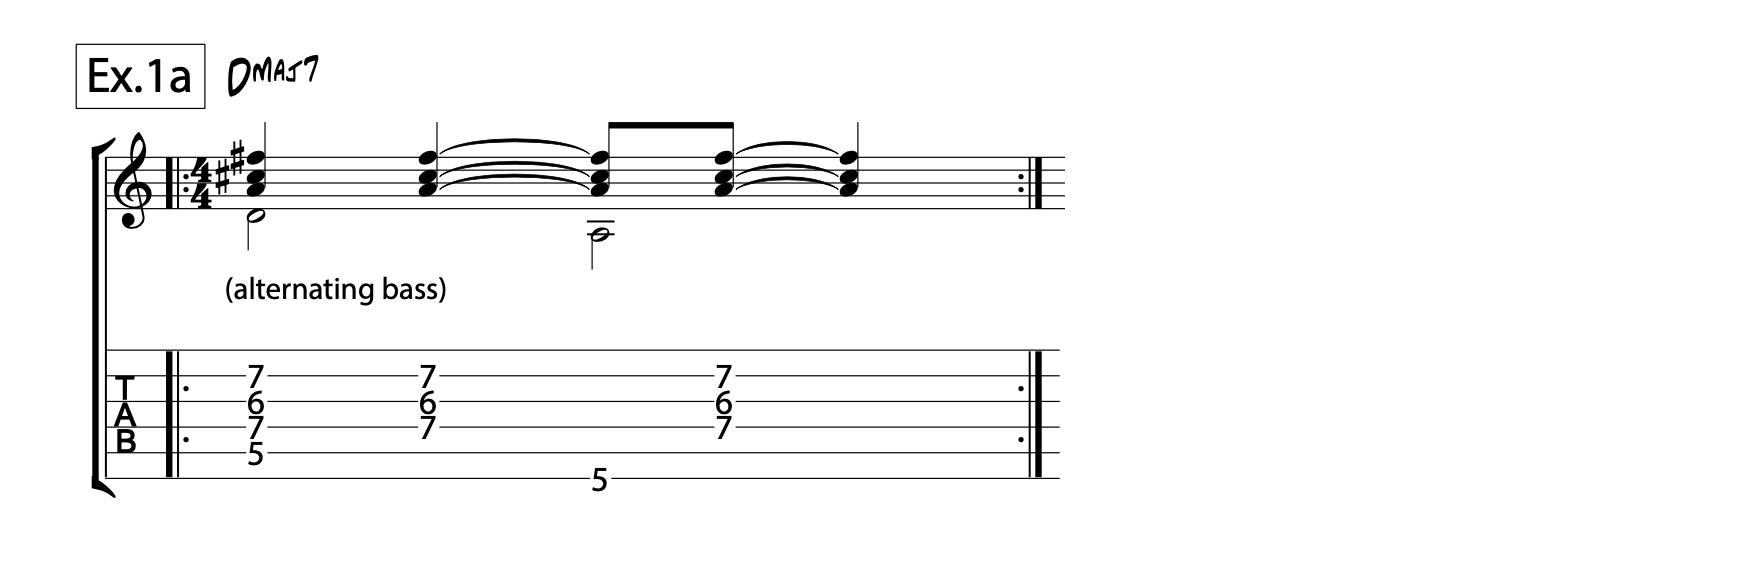 1a-bossa-nova-guitar-rhythm